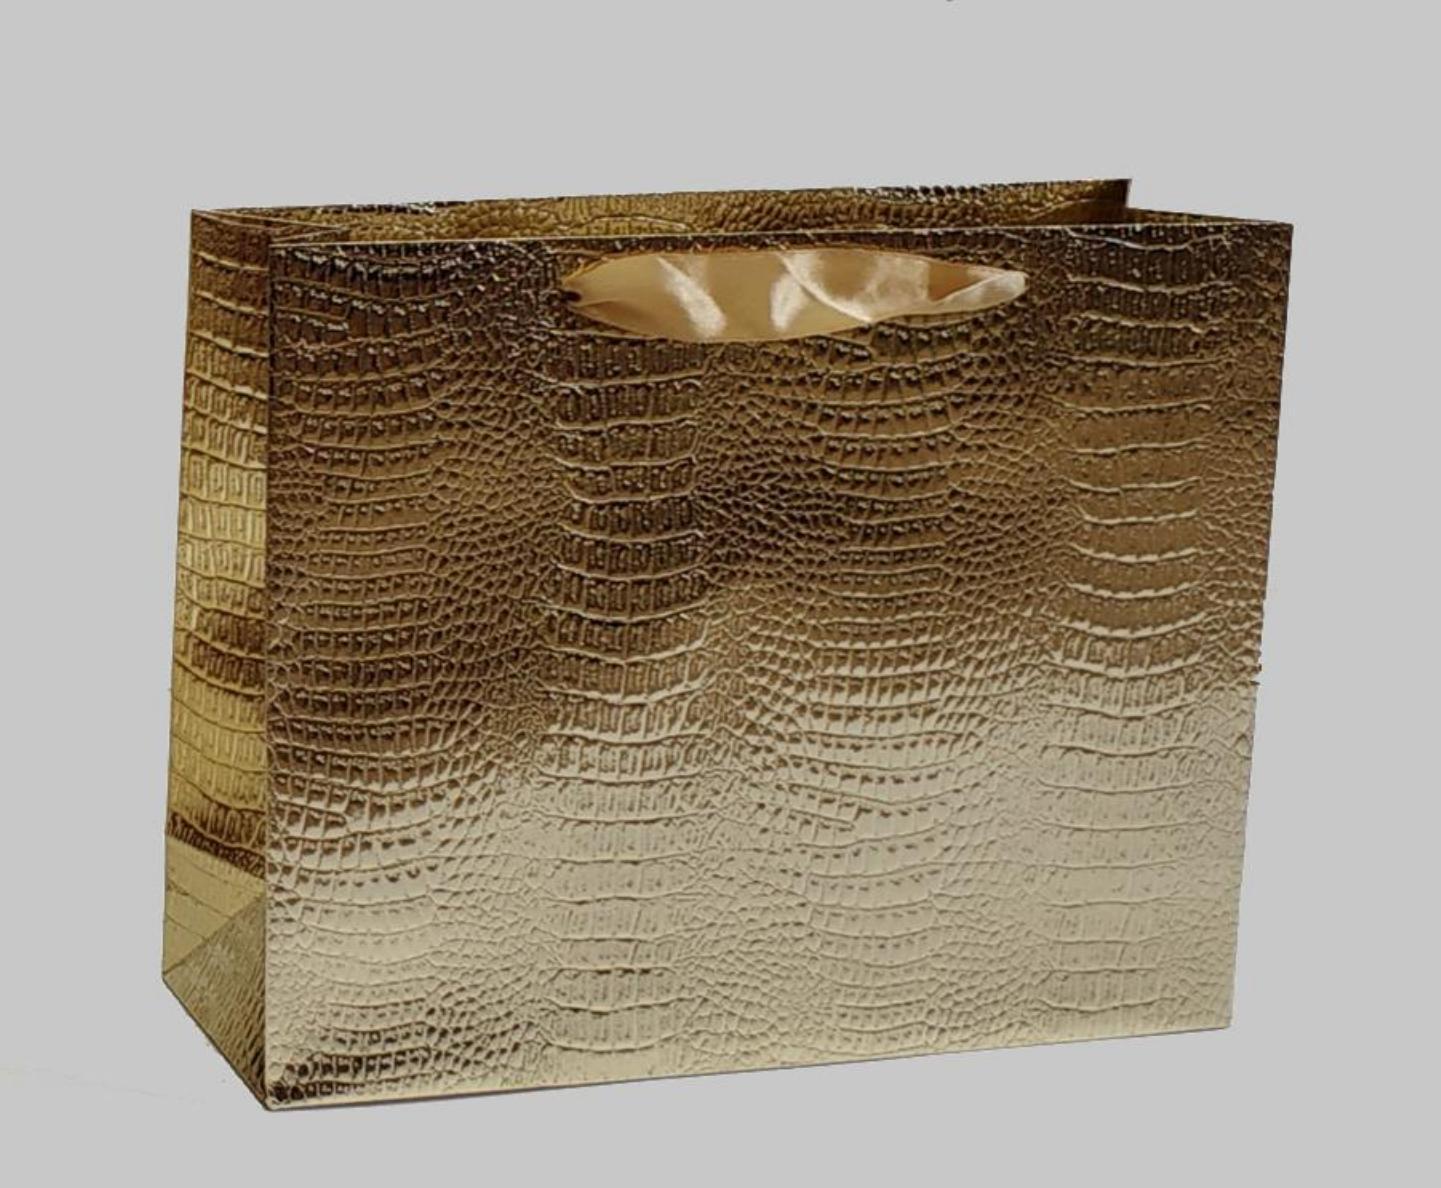 Подарочная упаковка Сумка-пакет 25x20x8см Cor Mulder Bag Croco 90453.JPG